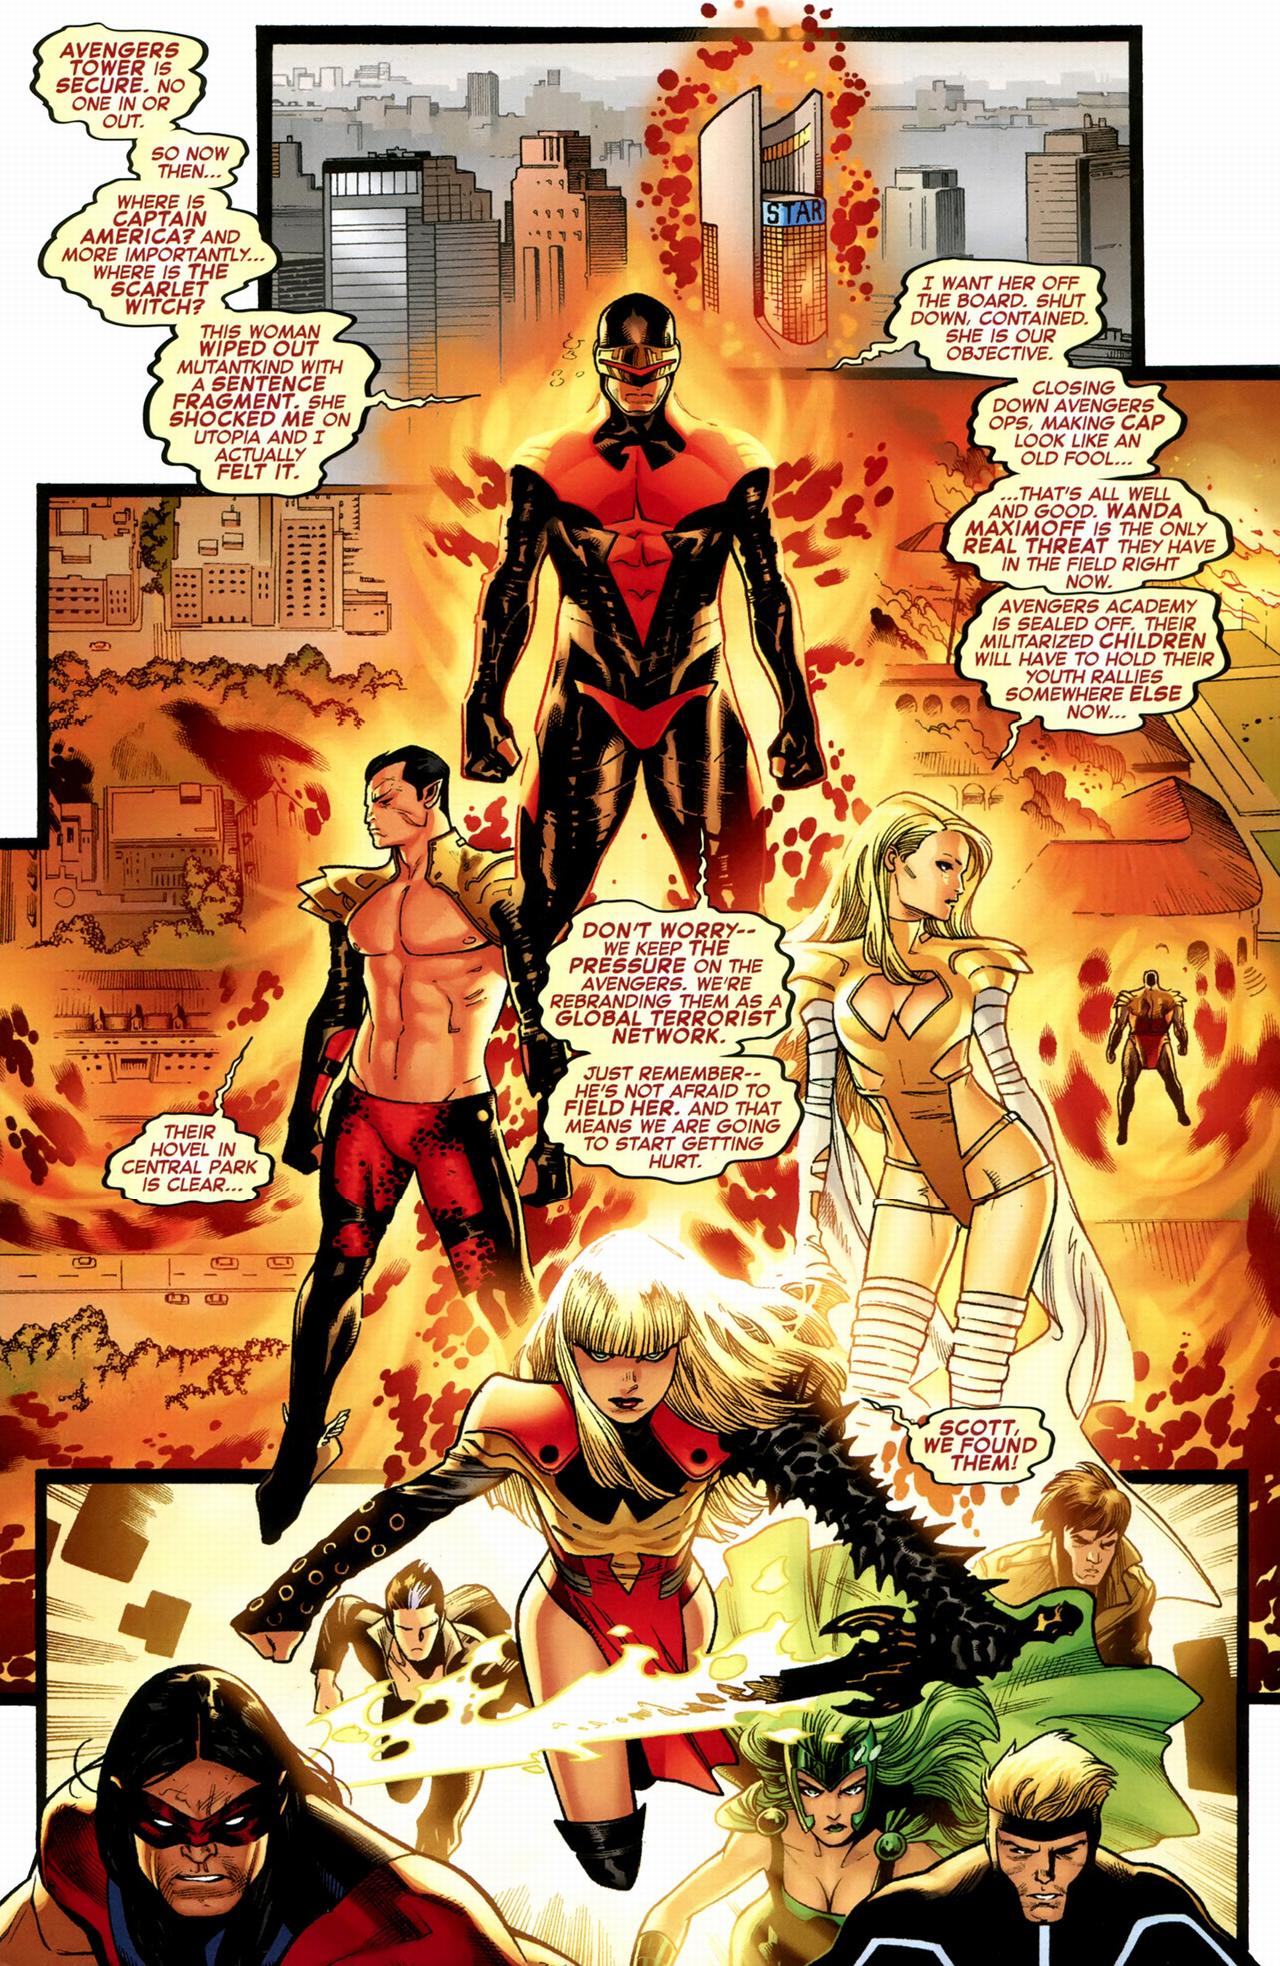 the x-men hunts down the avengers